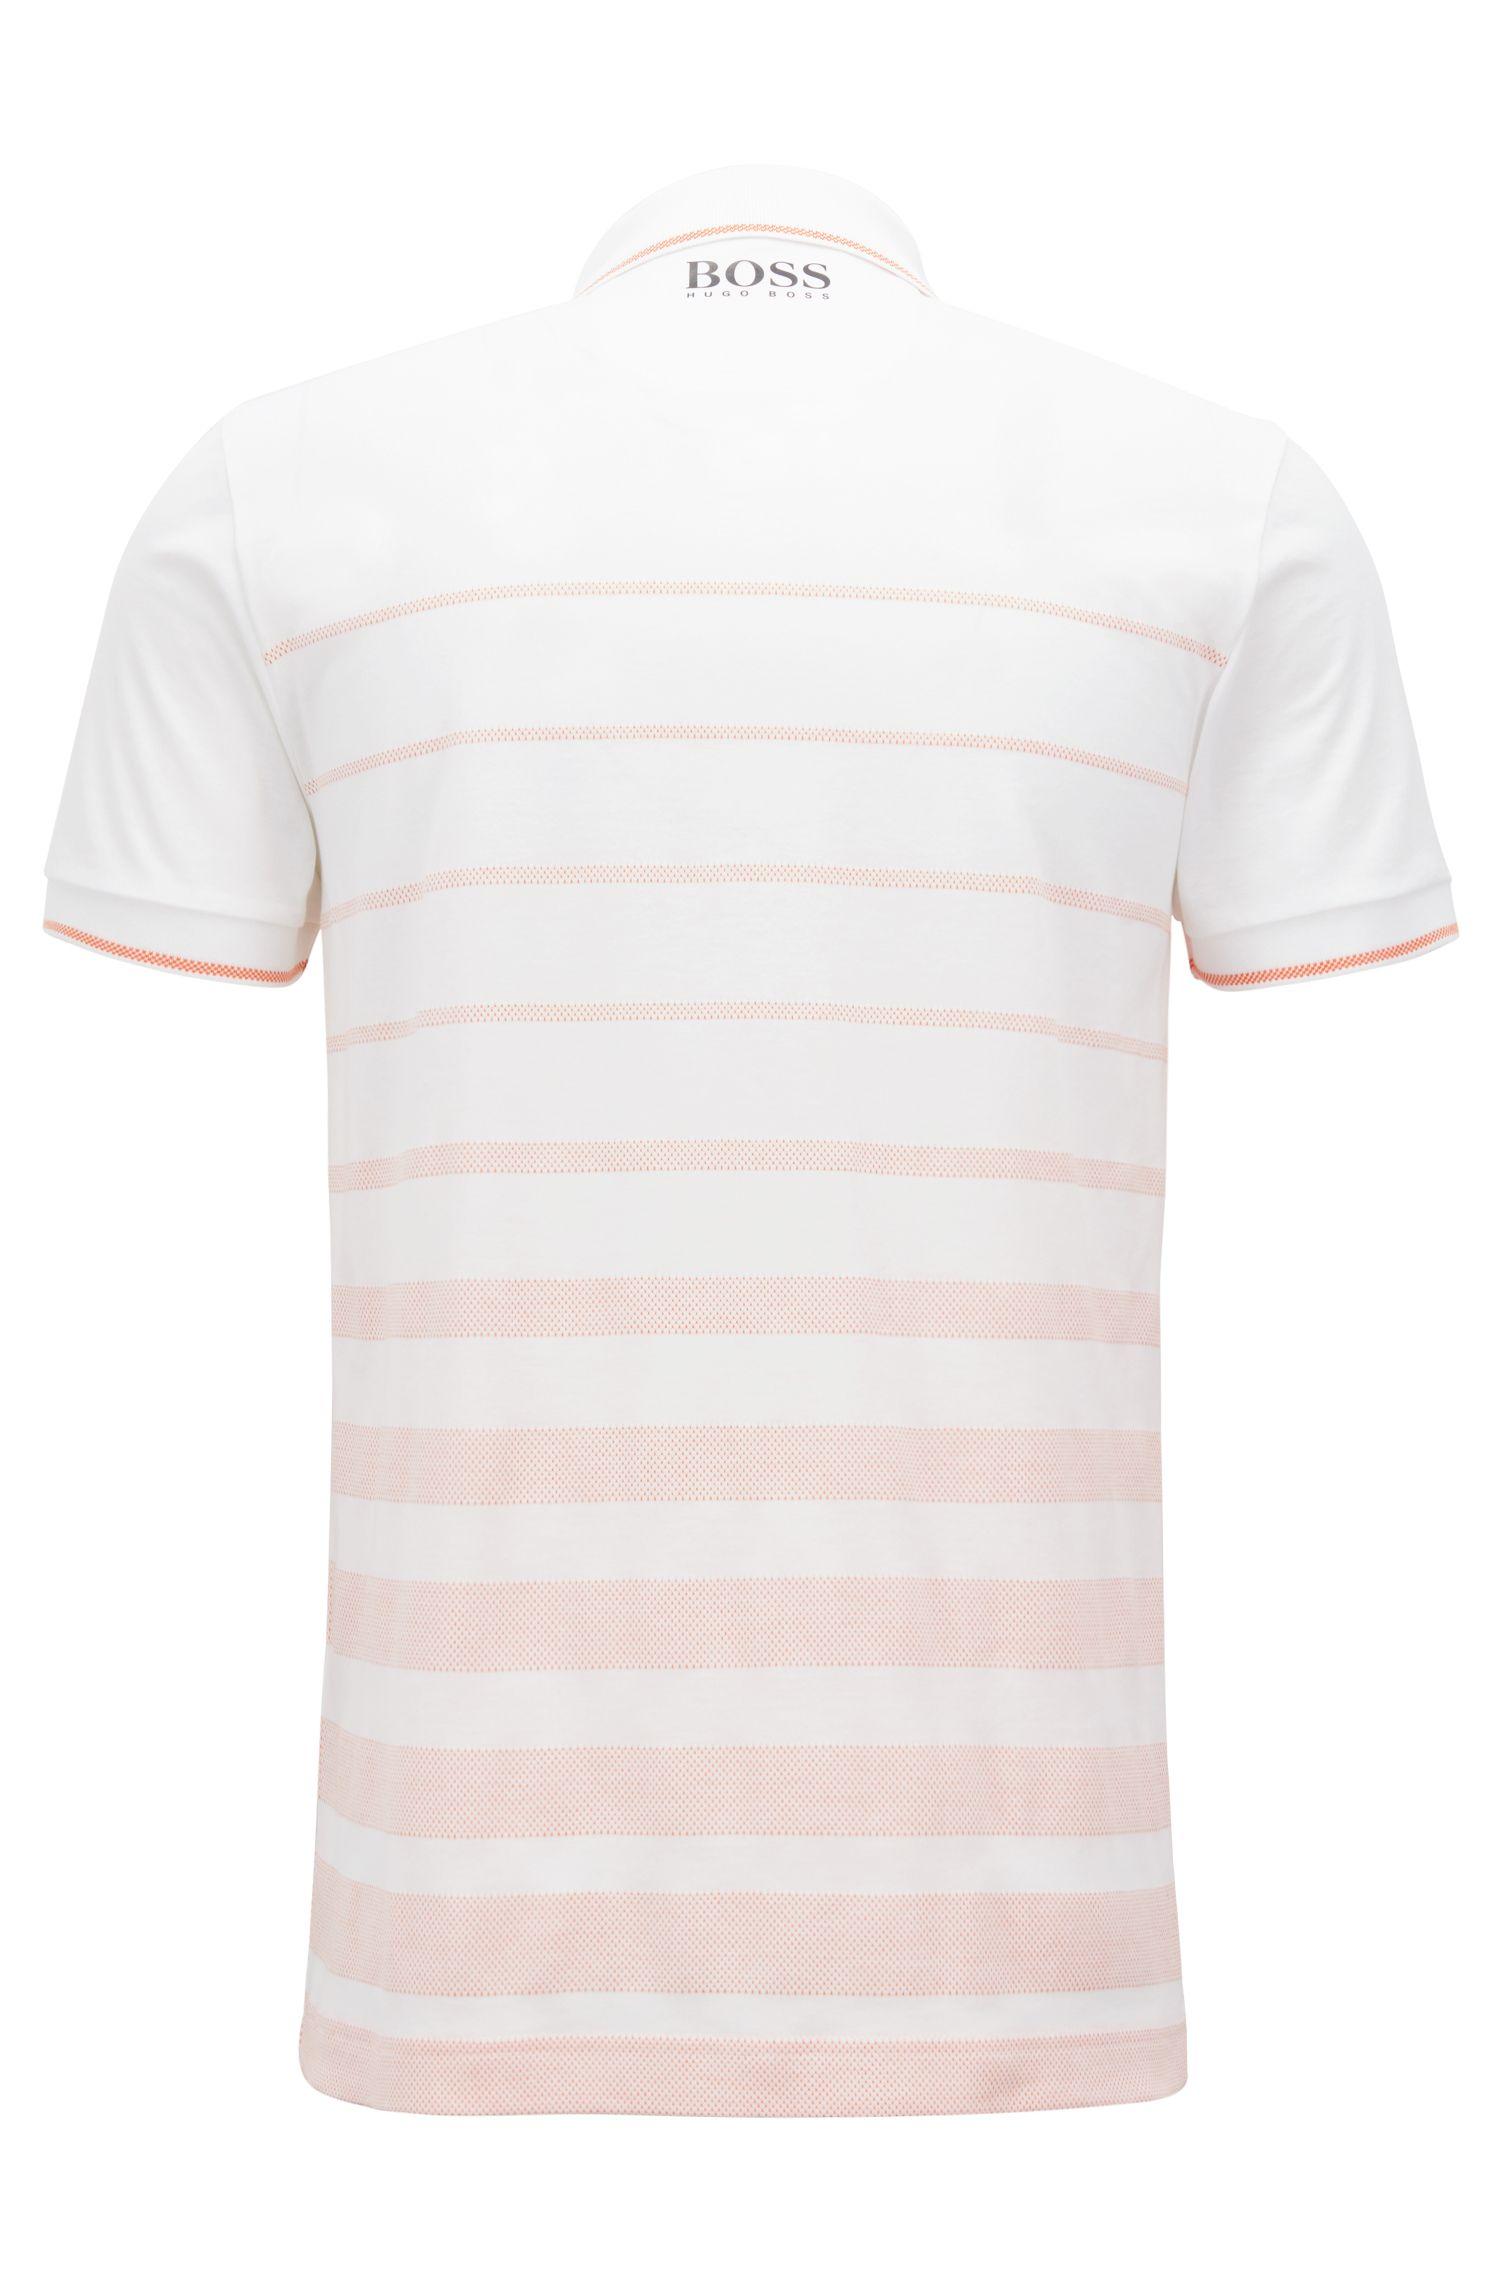 Cotton jacquard polo shirt with moisture management BOSS